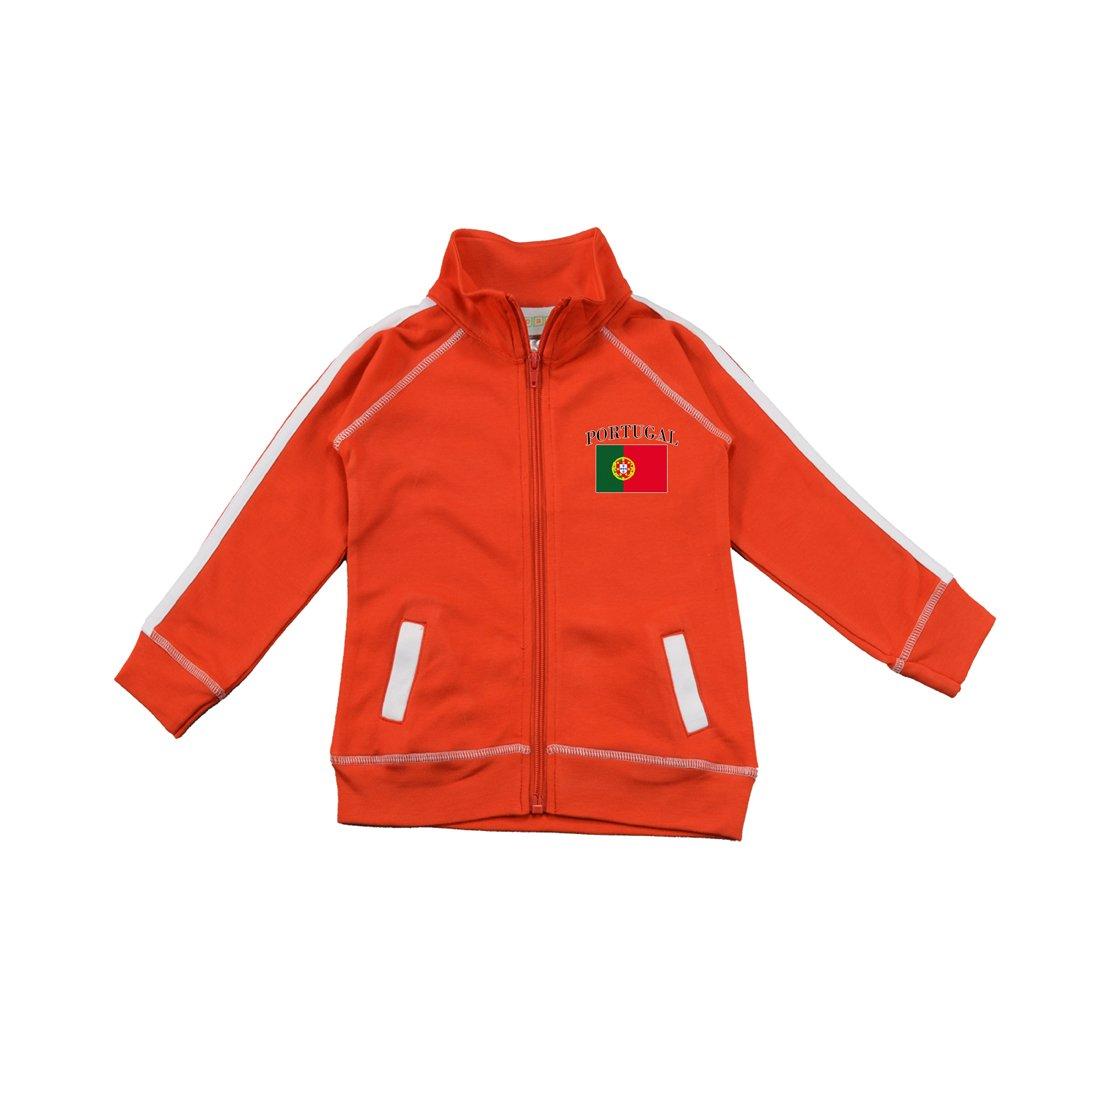 PAM GM Little Boys Portugal Soccer Track Jacket 3577RD-POR